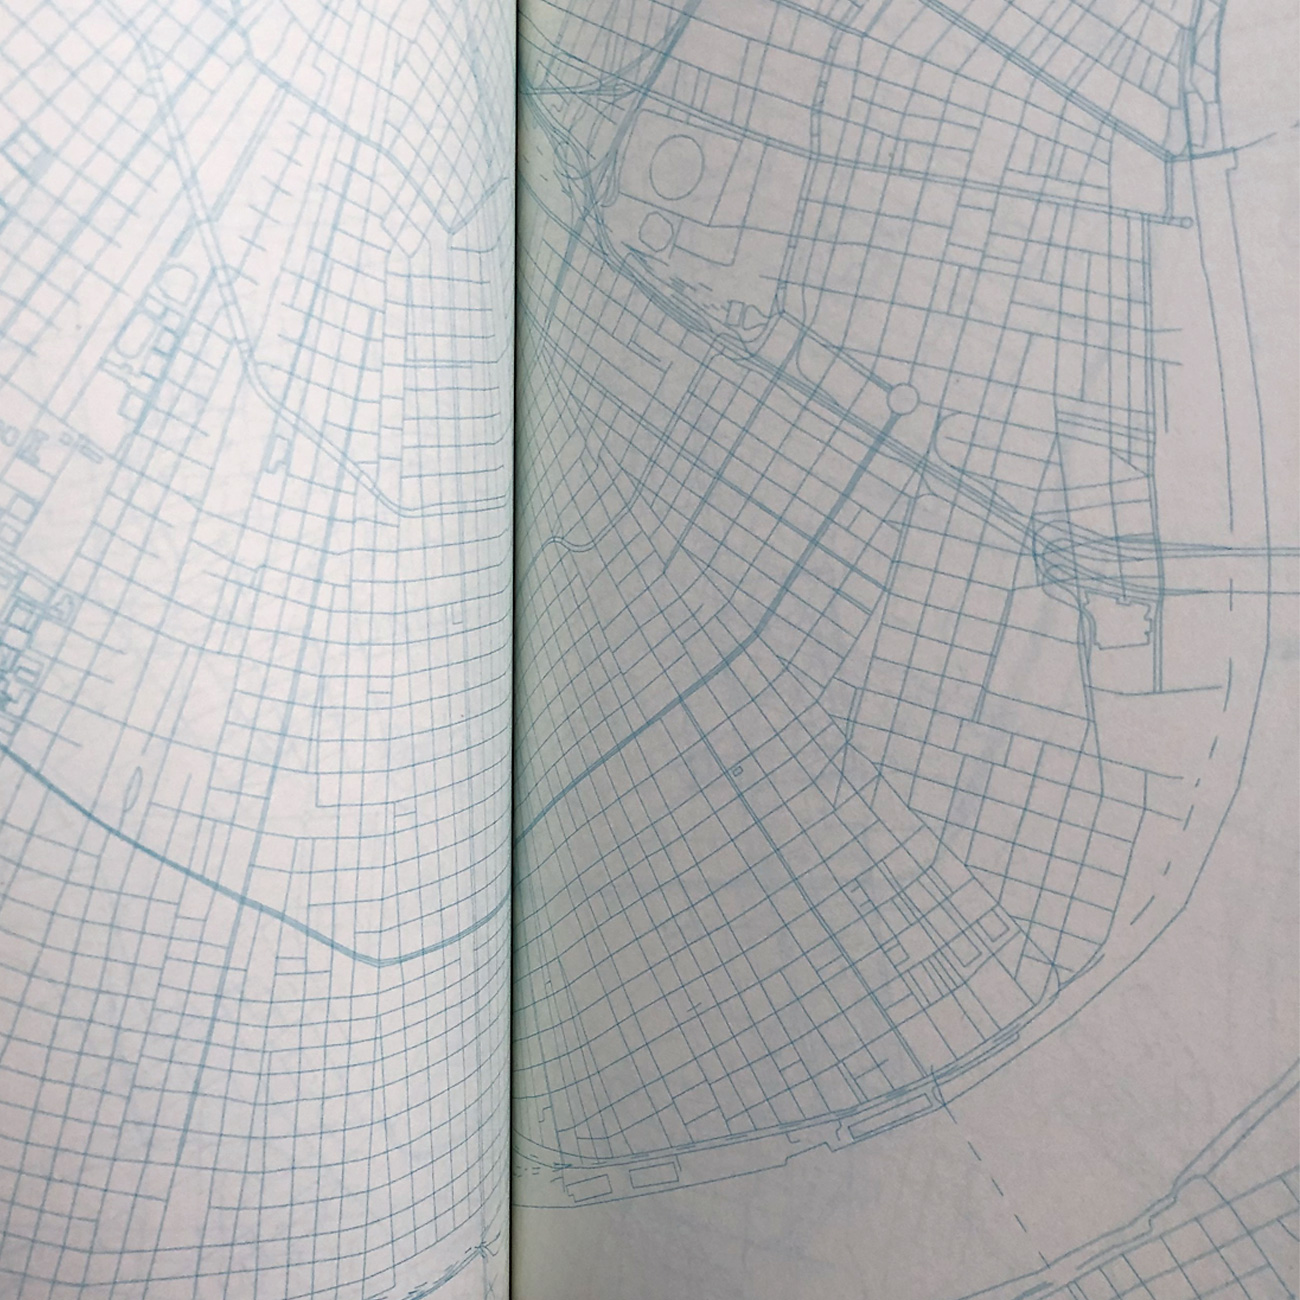 Urban Gridded Notebook, blau linear gedruckte Stadtpläne der Welt,